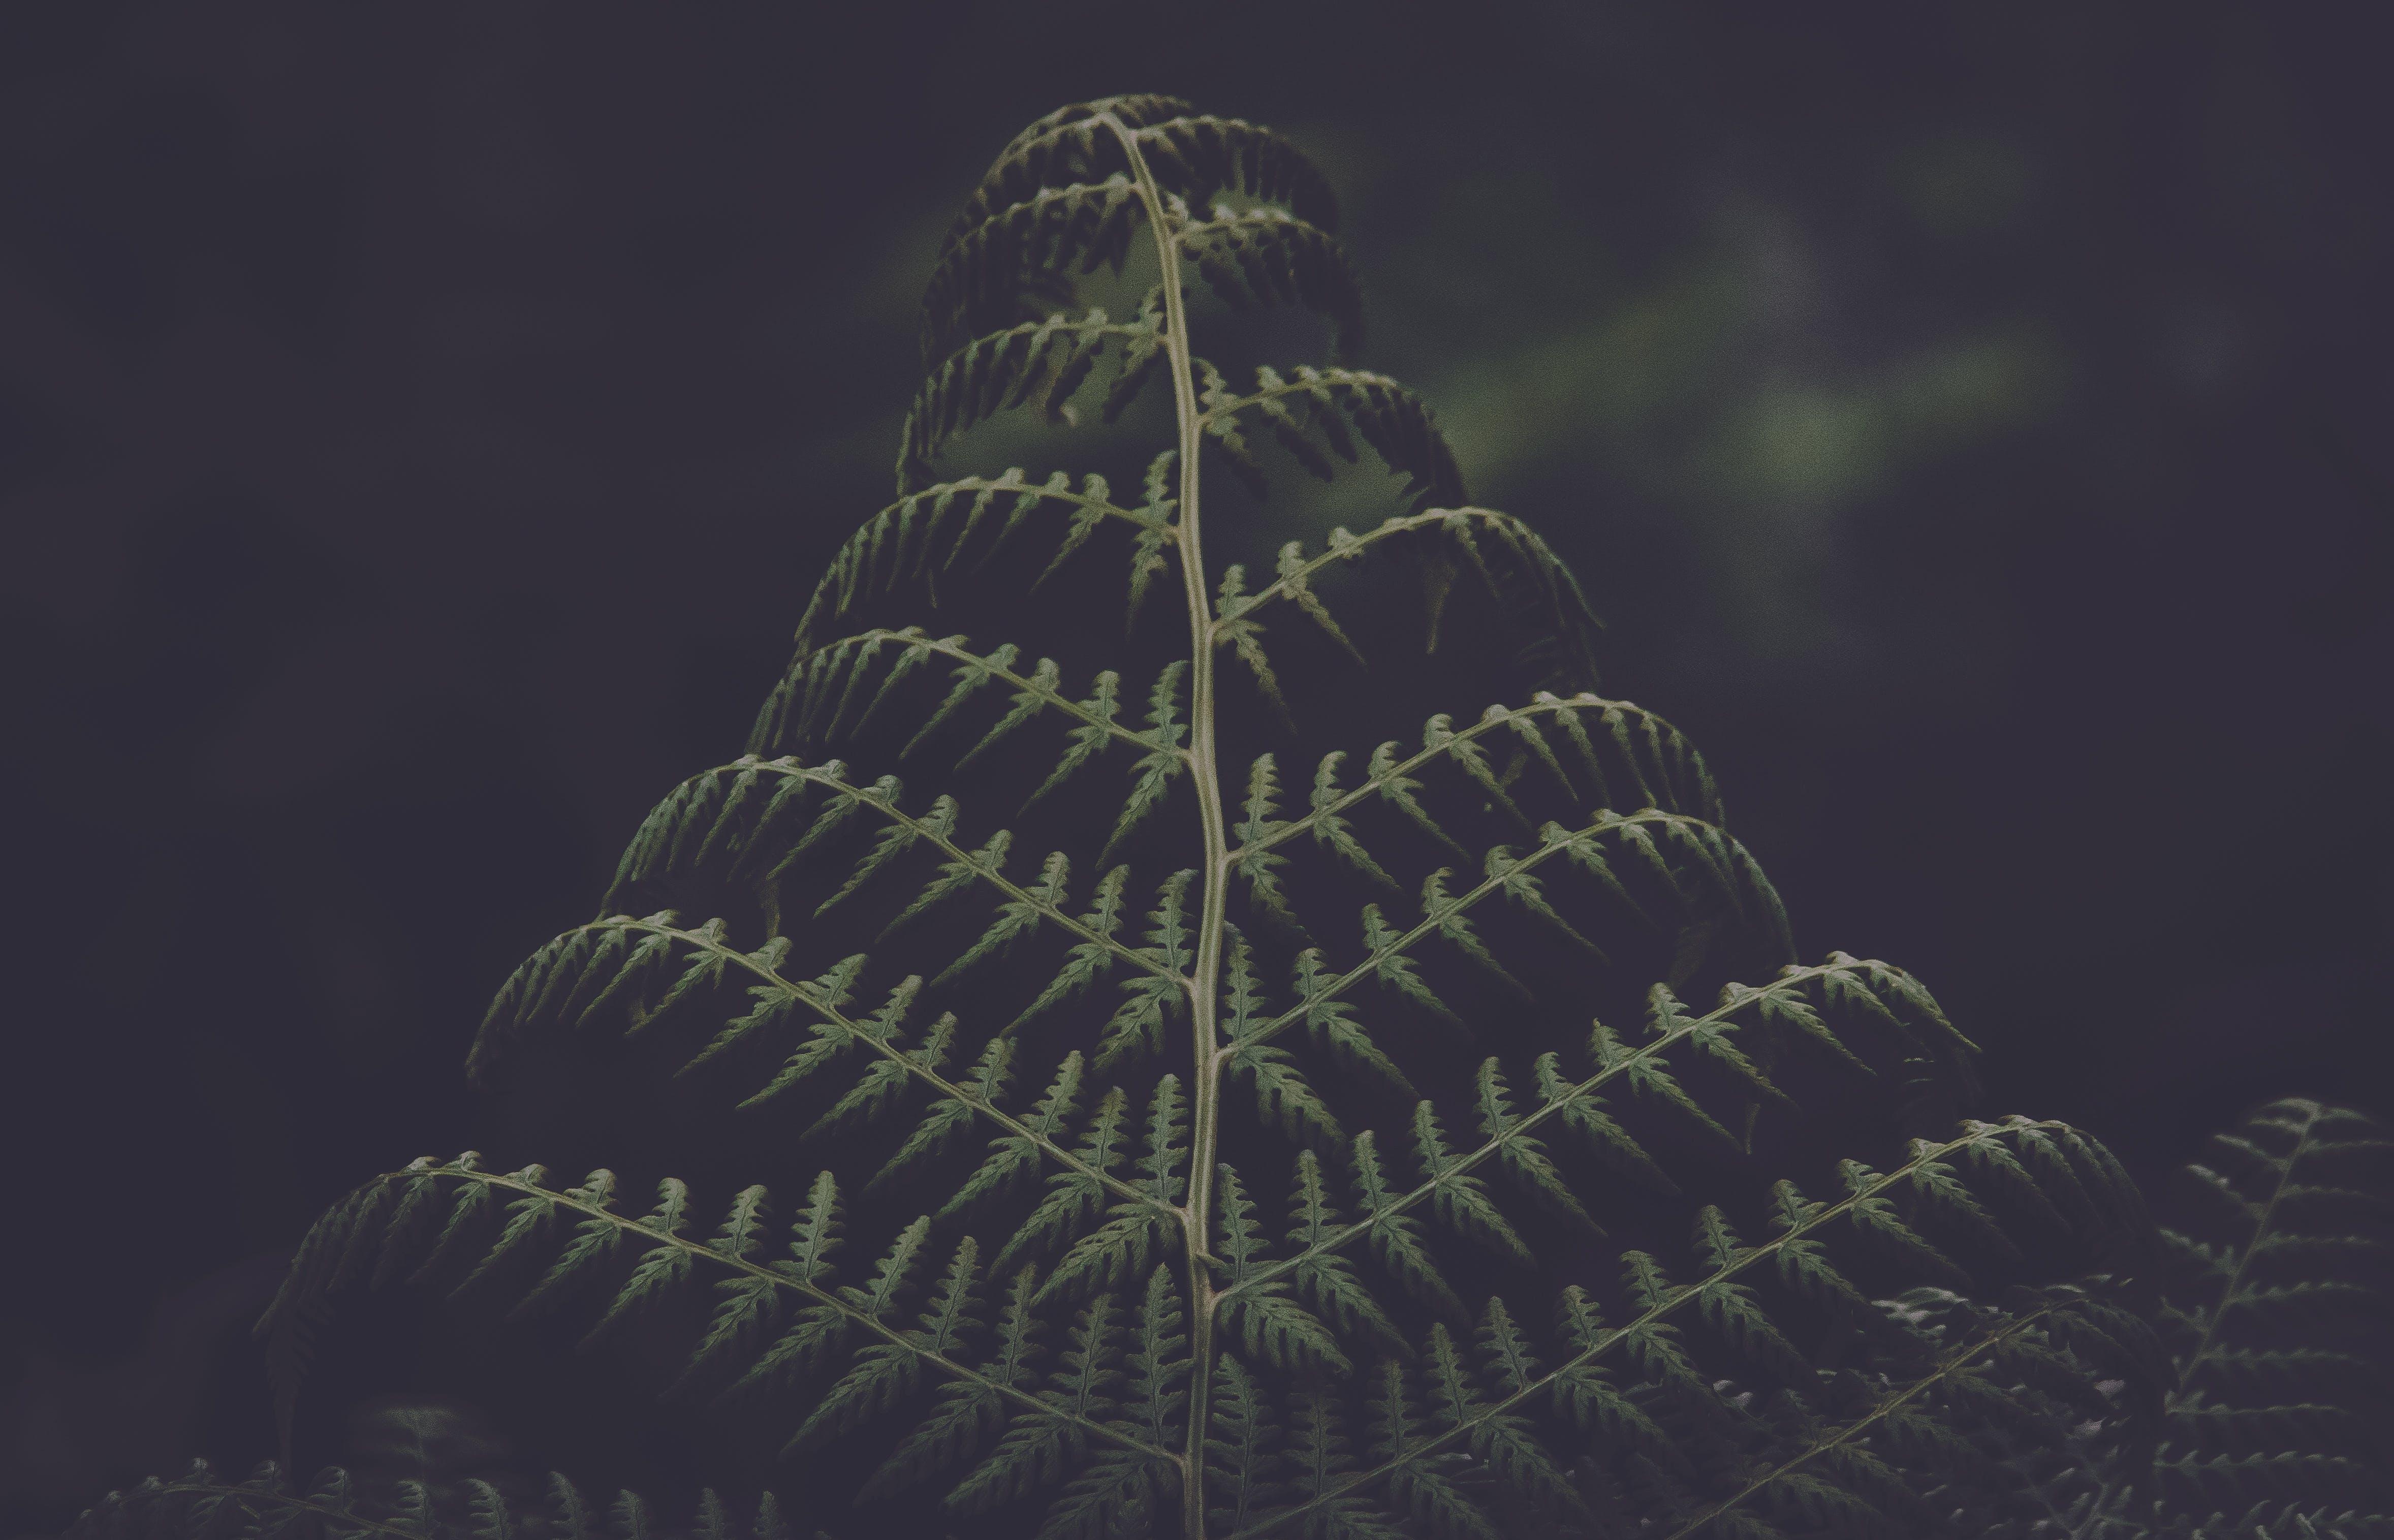 Low-light Photo Of Green Pinnate Leaf